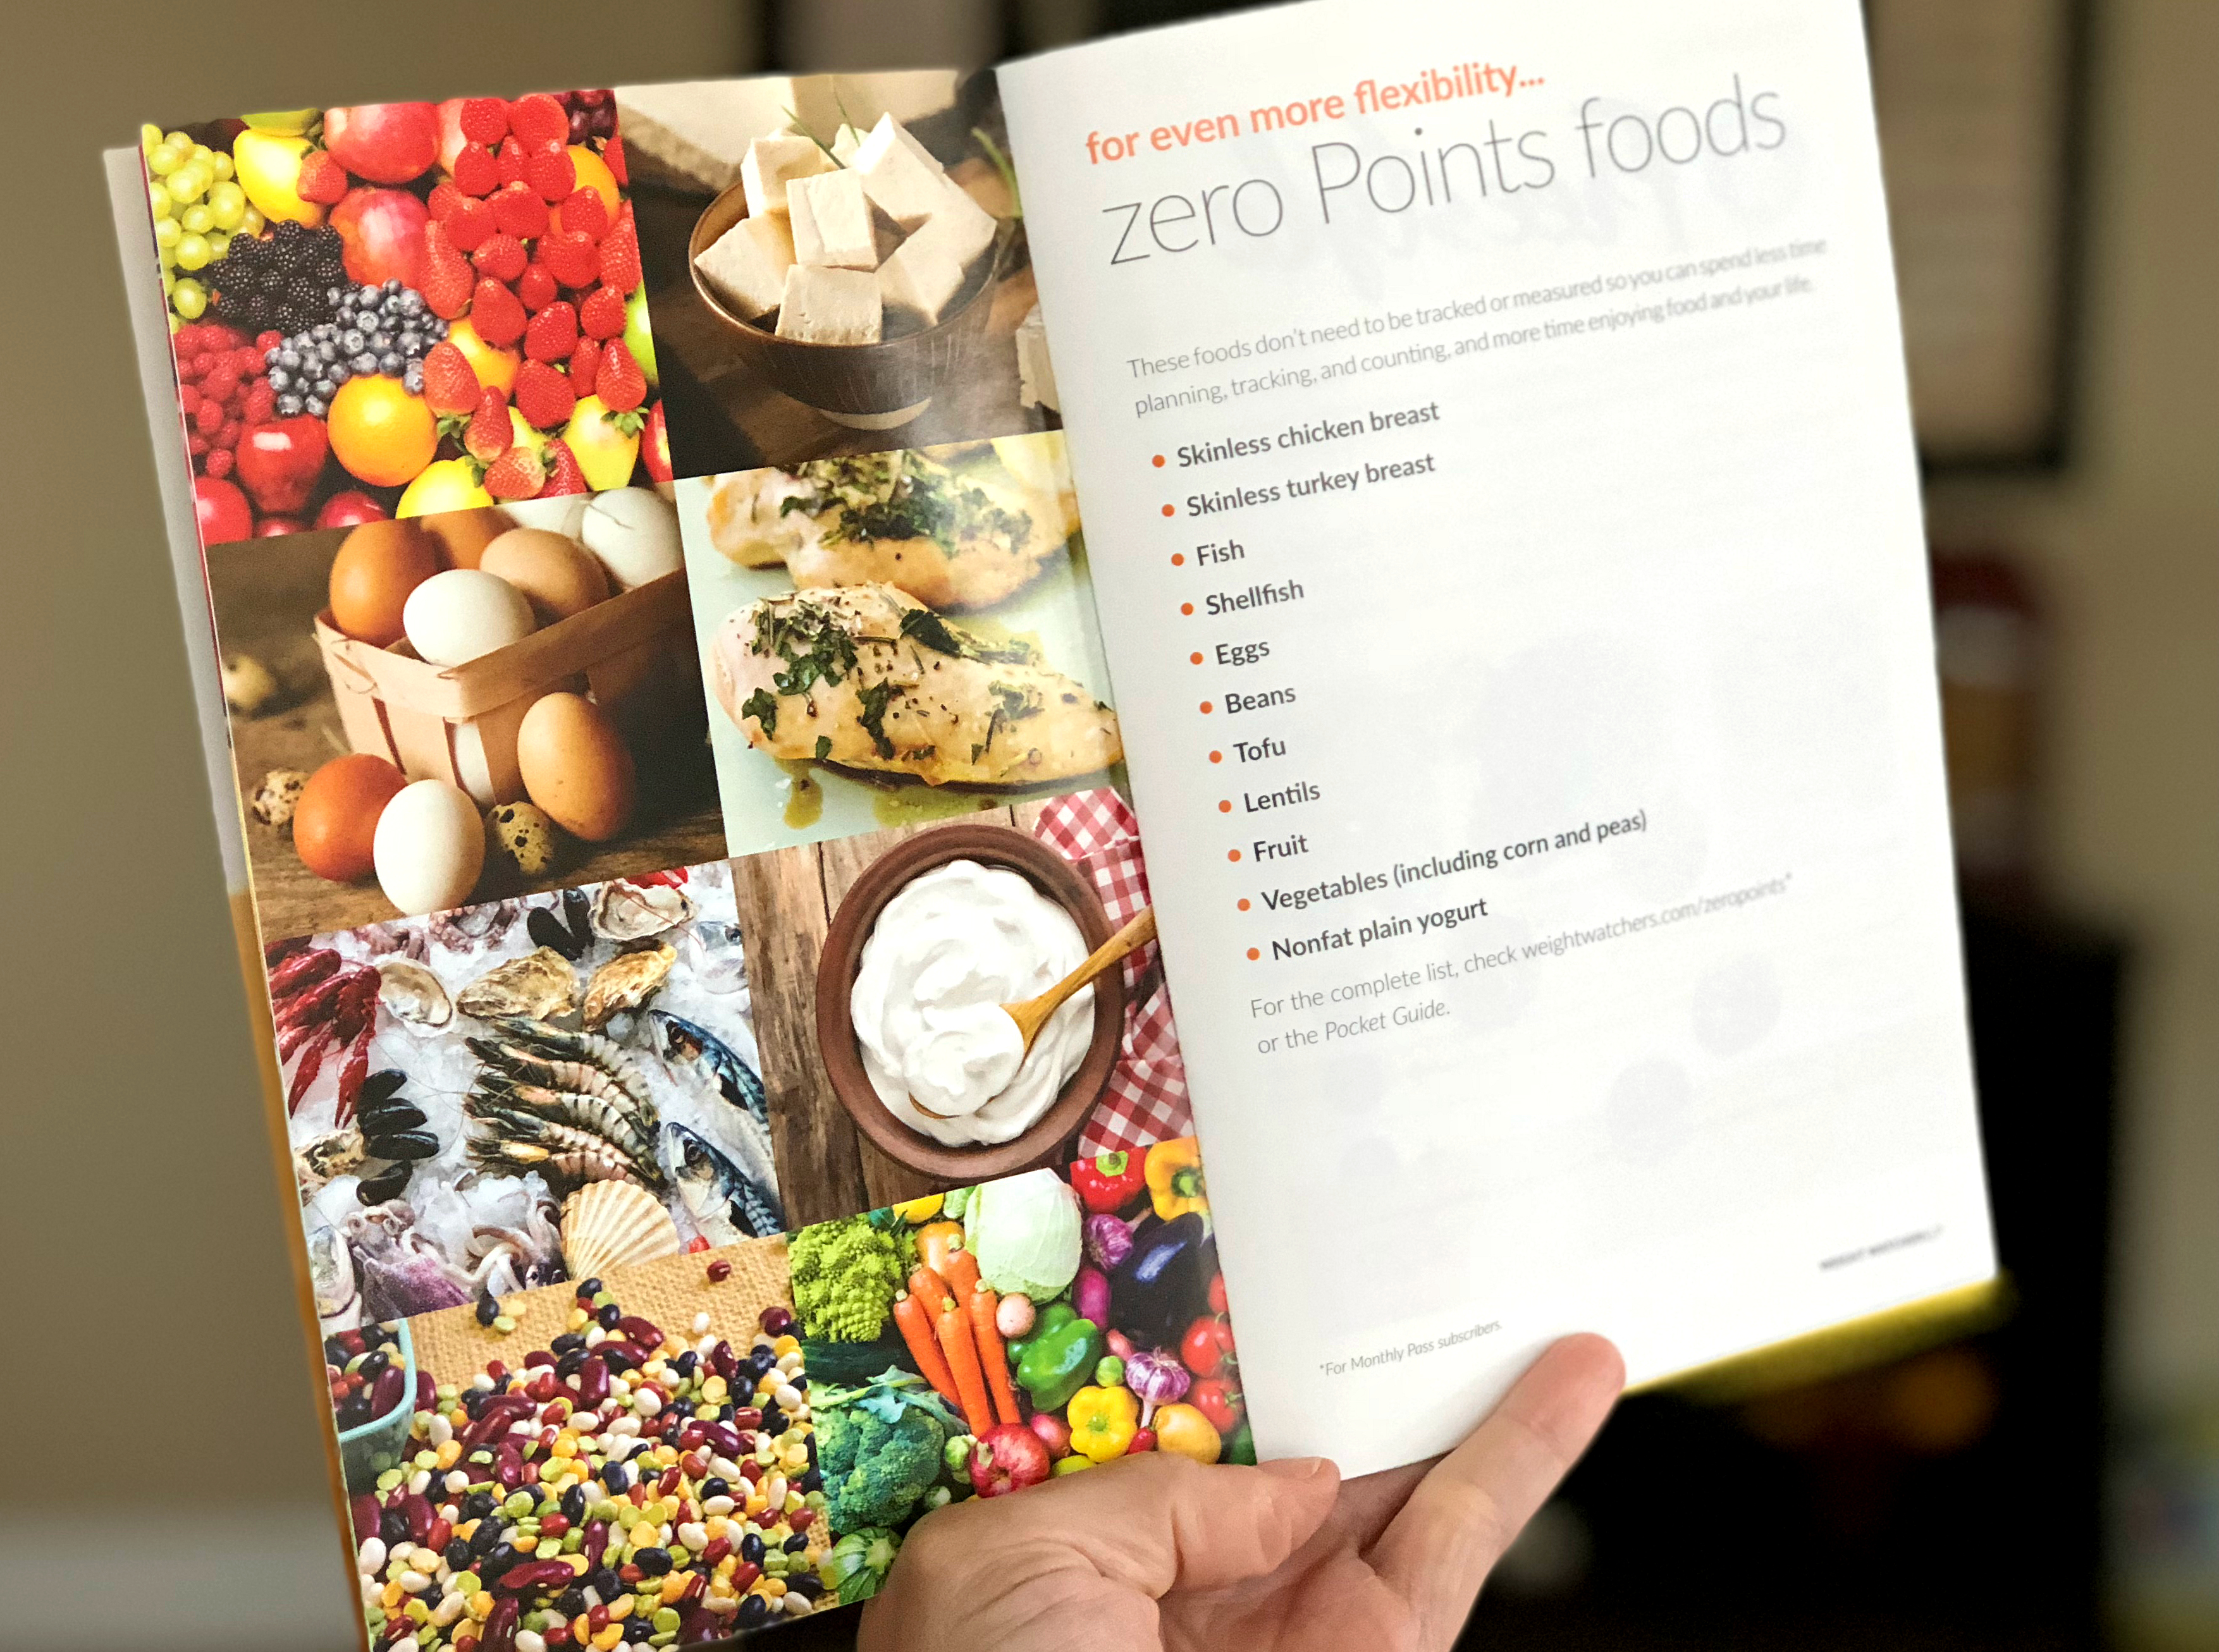 New weight watchers program deal – Weight Watchers Zero point foods